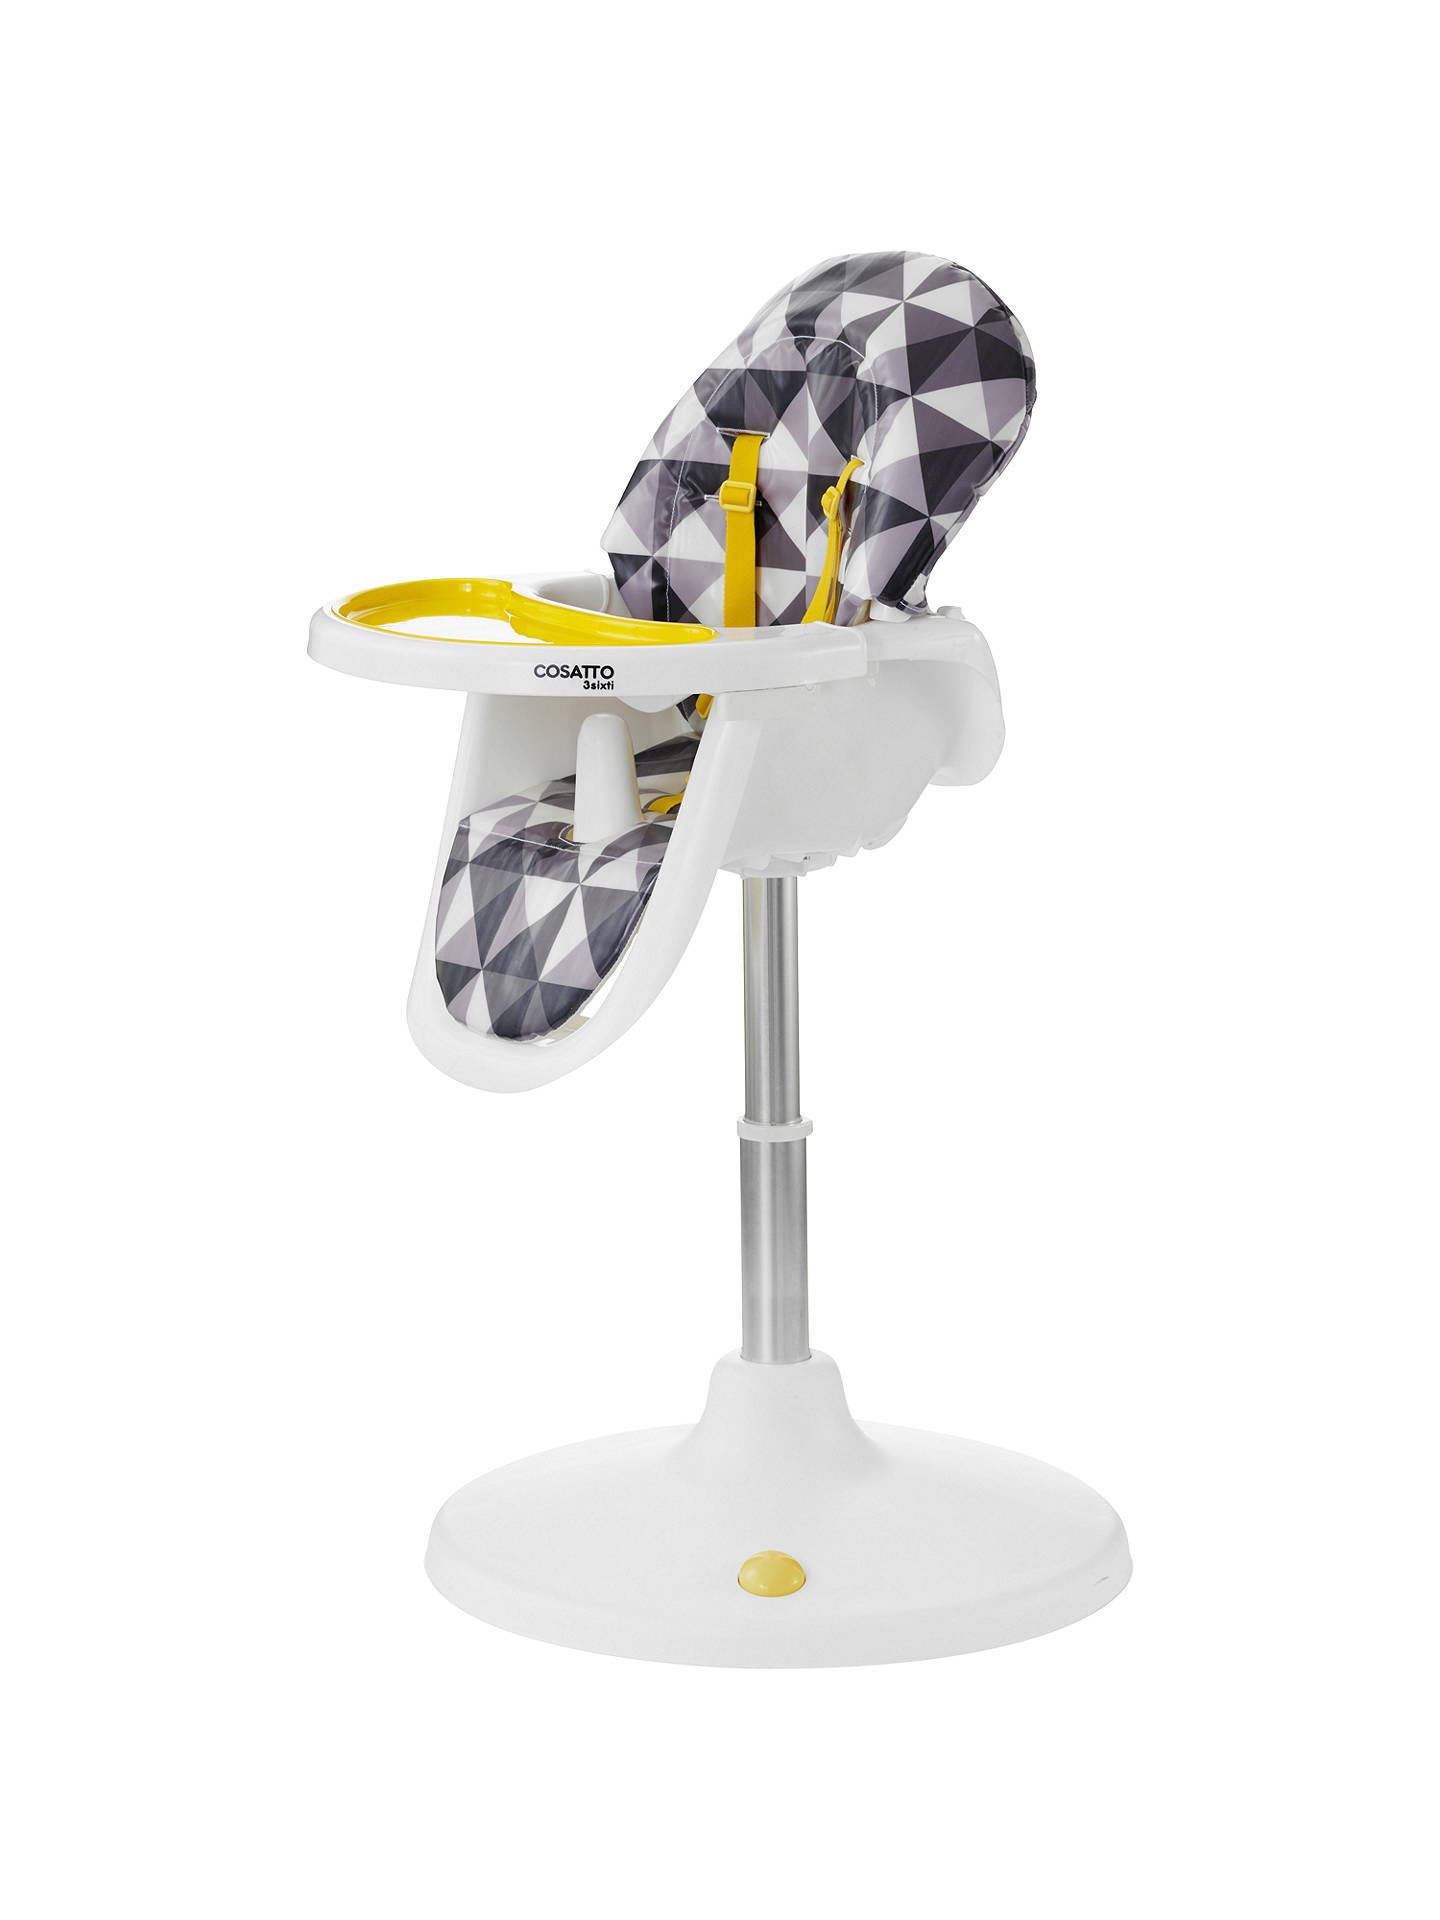 Wondrous Cosatto 3Sixti Circle Highchair Op Pop At John Lewis Partners Creativecarmelina Interior Chair Design Creativecarmelinacom